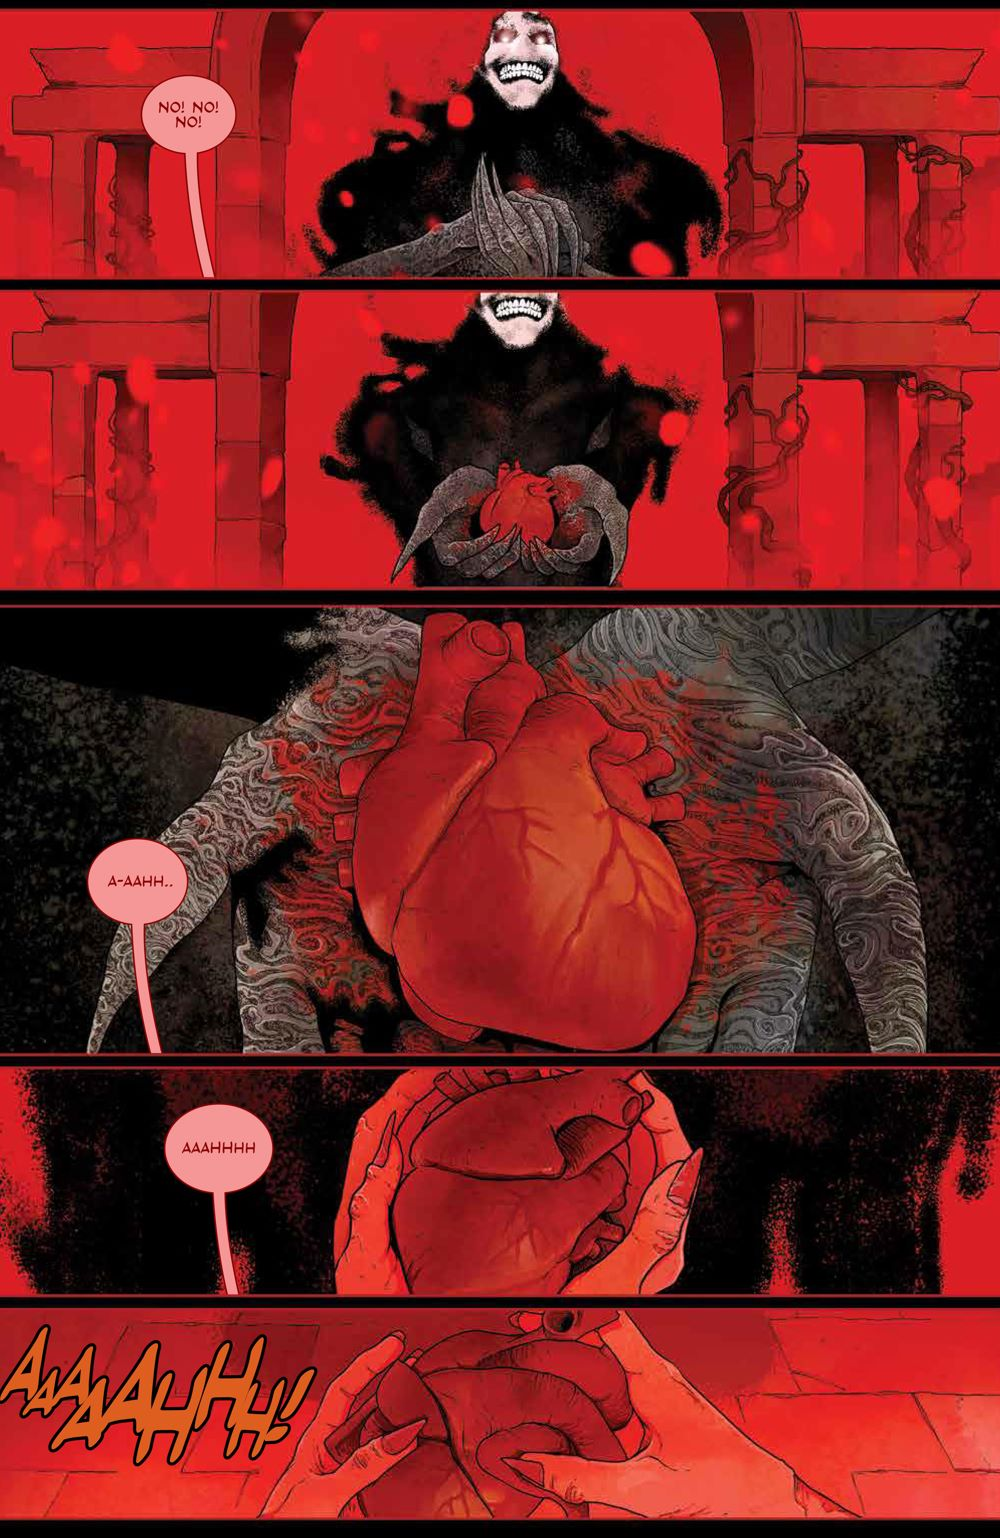 RedMother_v3_SC_PRESS_21 ComicList Previews: RED MOTHER VOLUME 3 TP